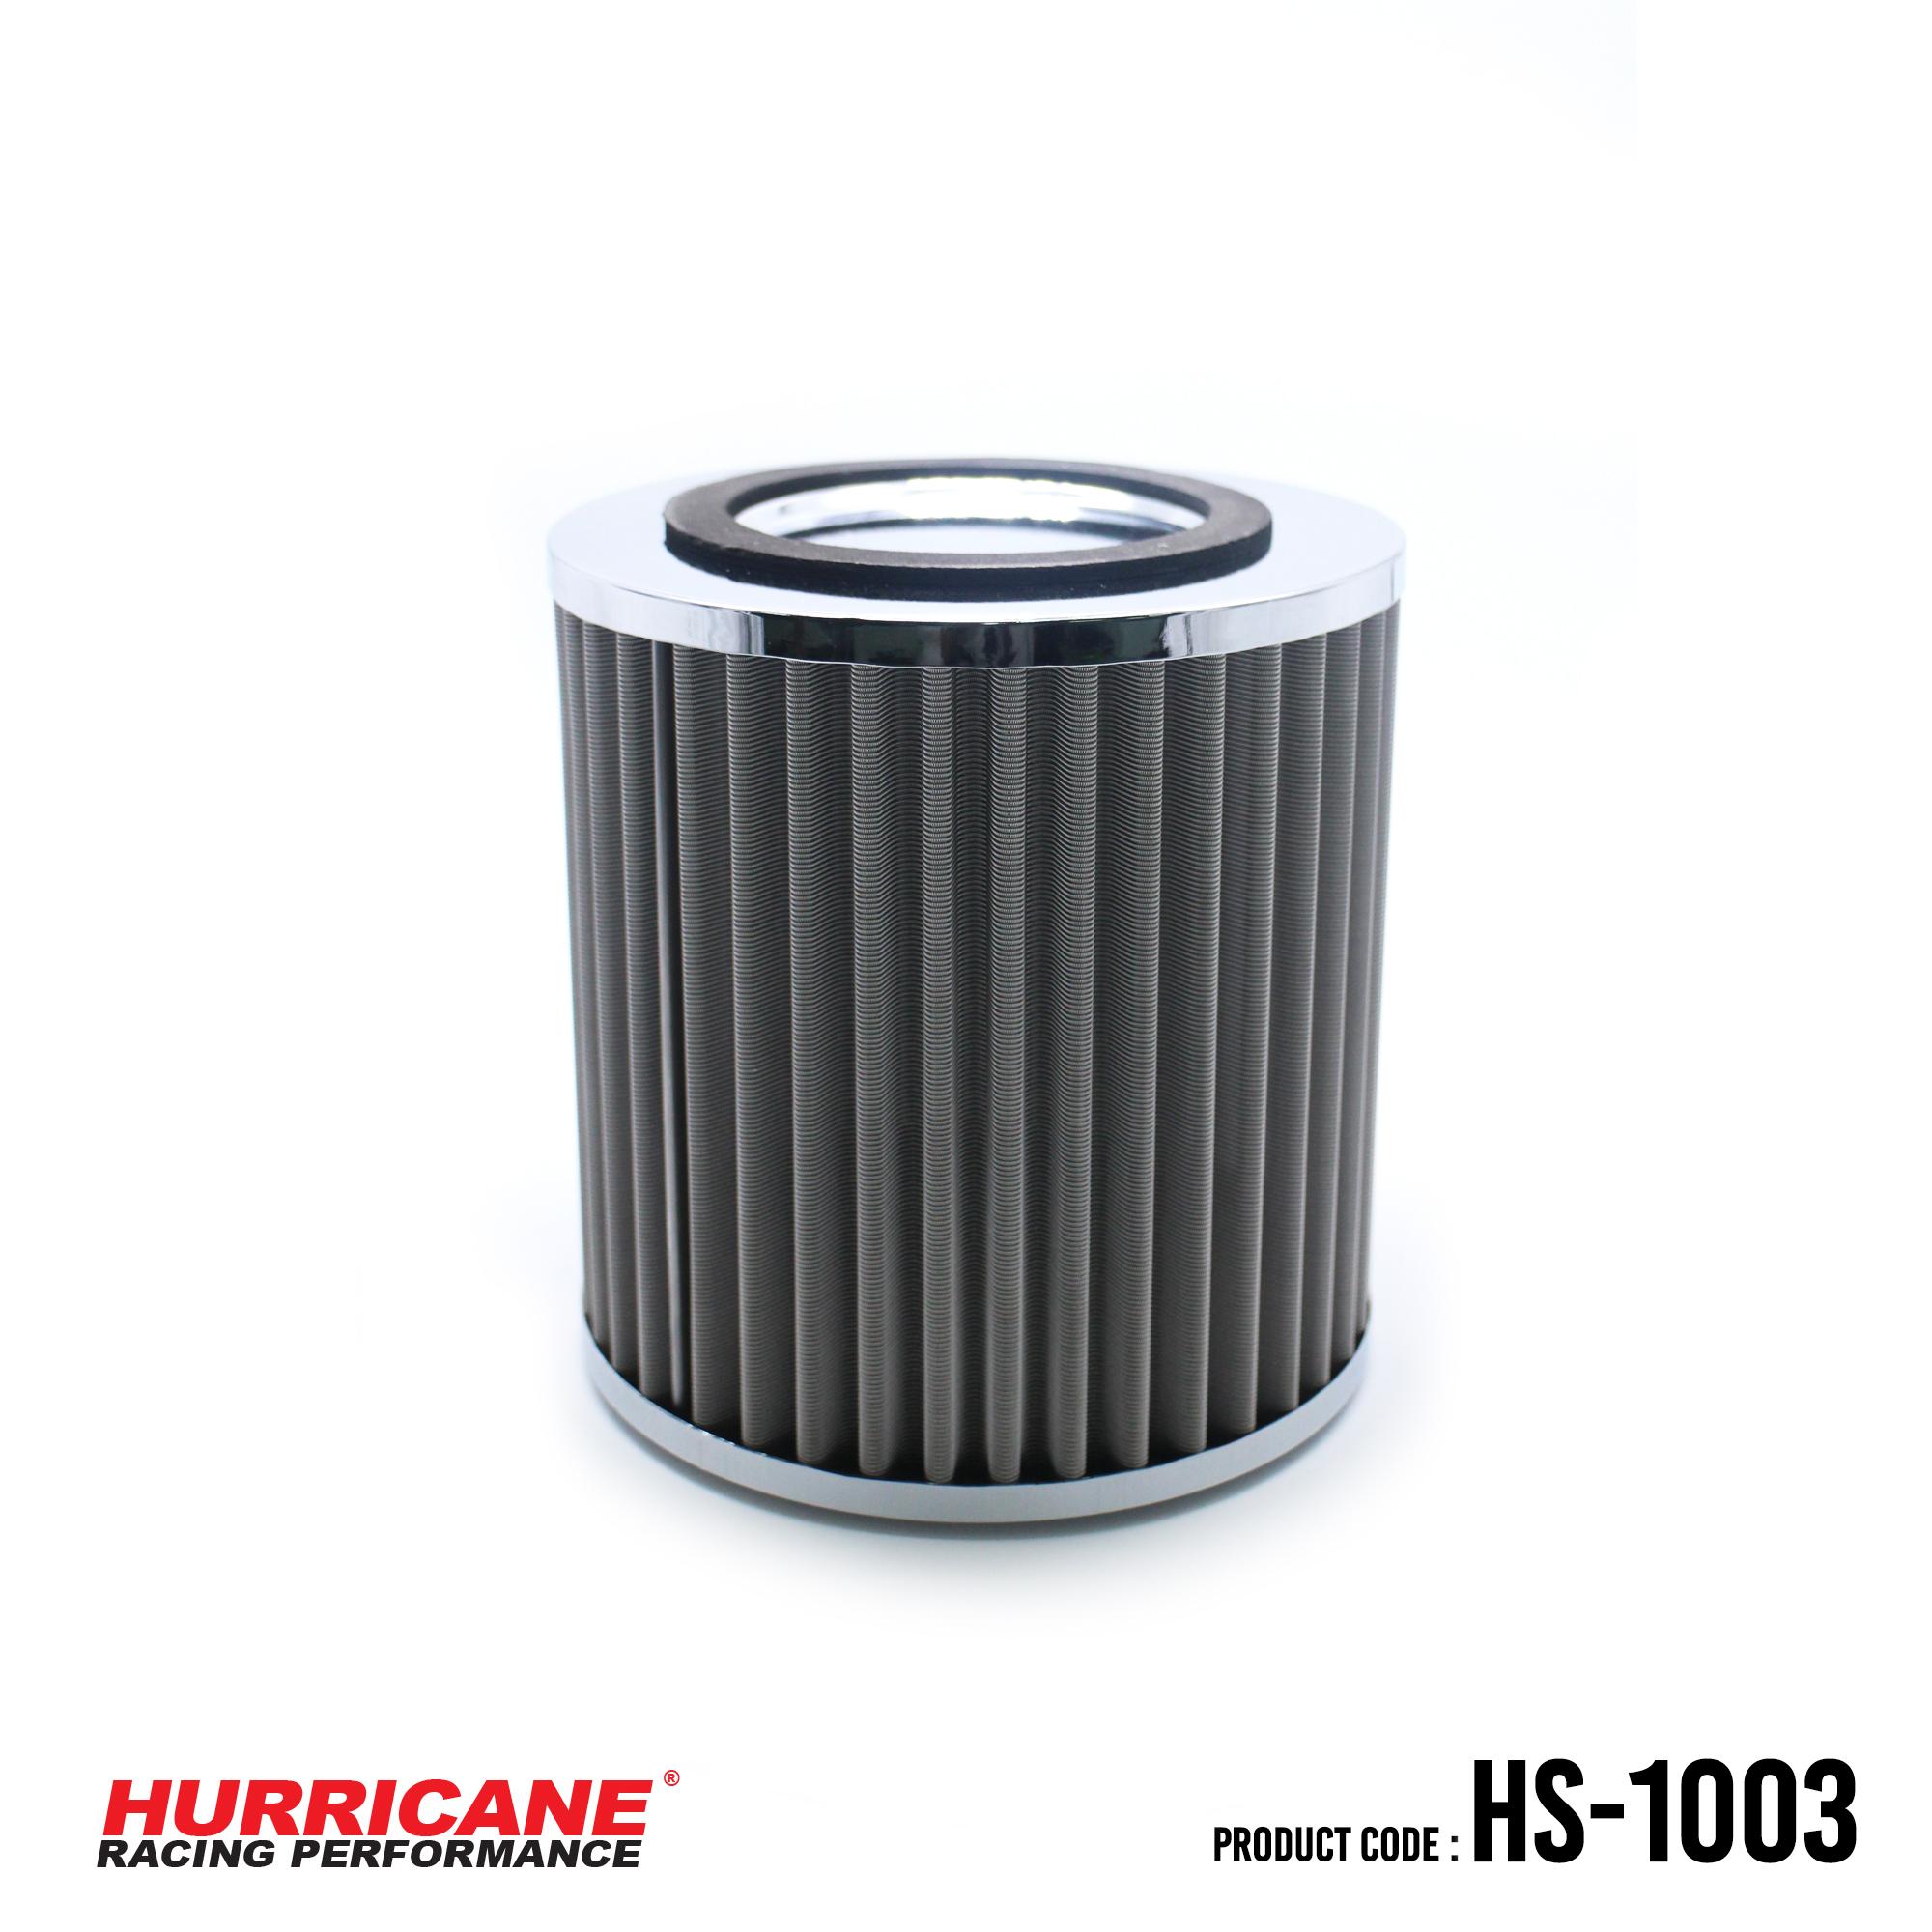 HURRICANE STAINLESS STEEL AIR FILTER FOR HS-1003 Isuzu